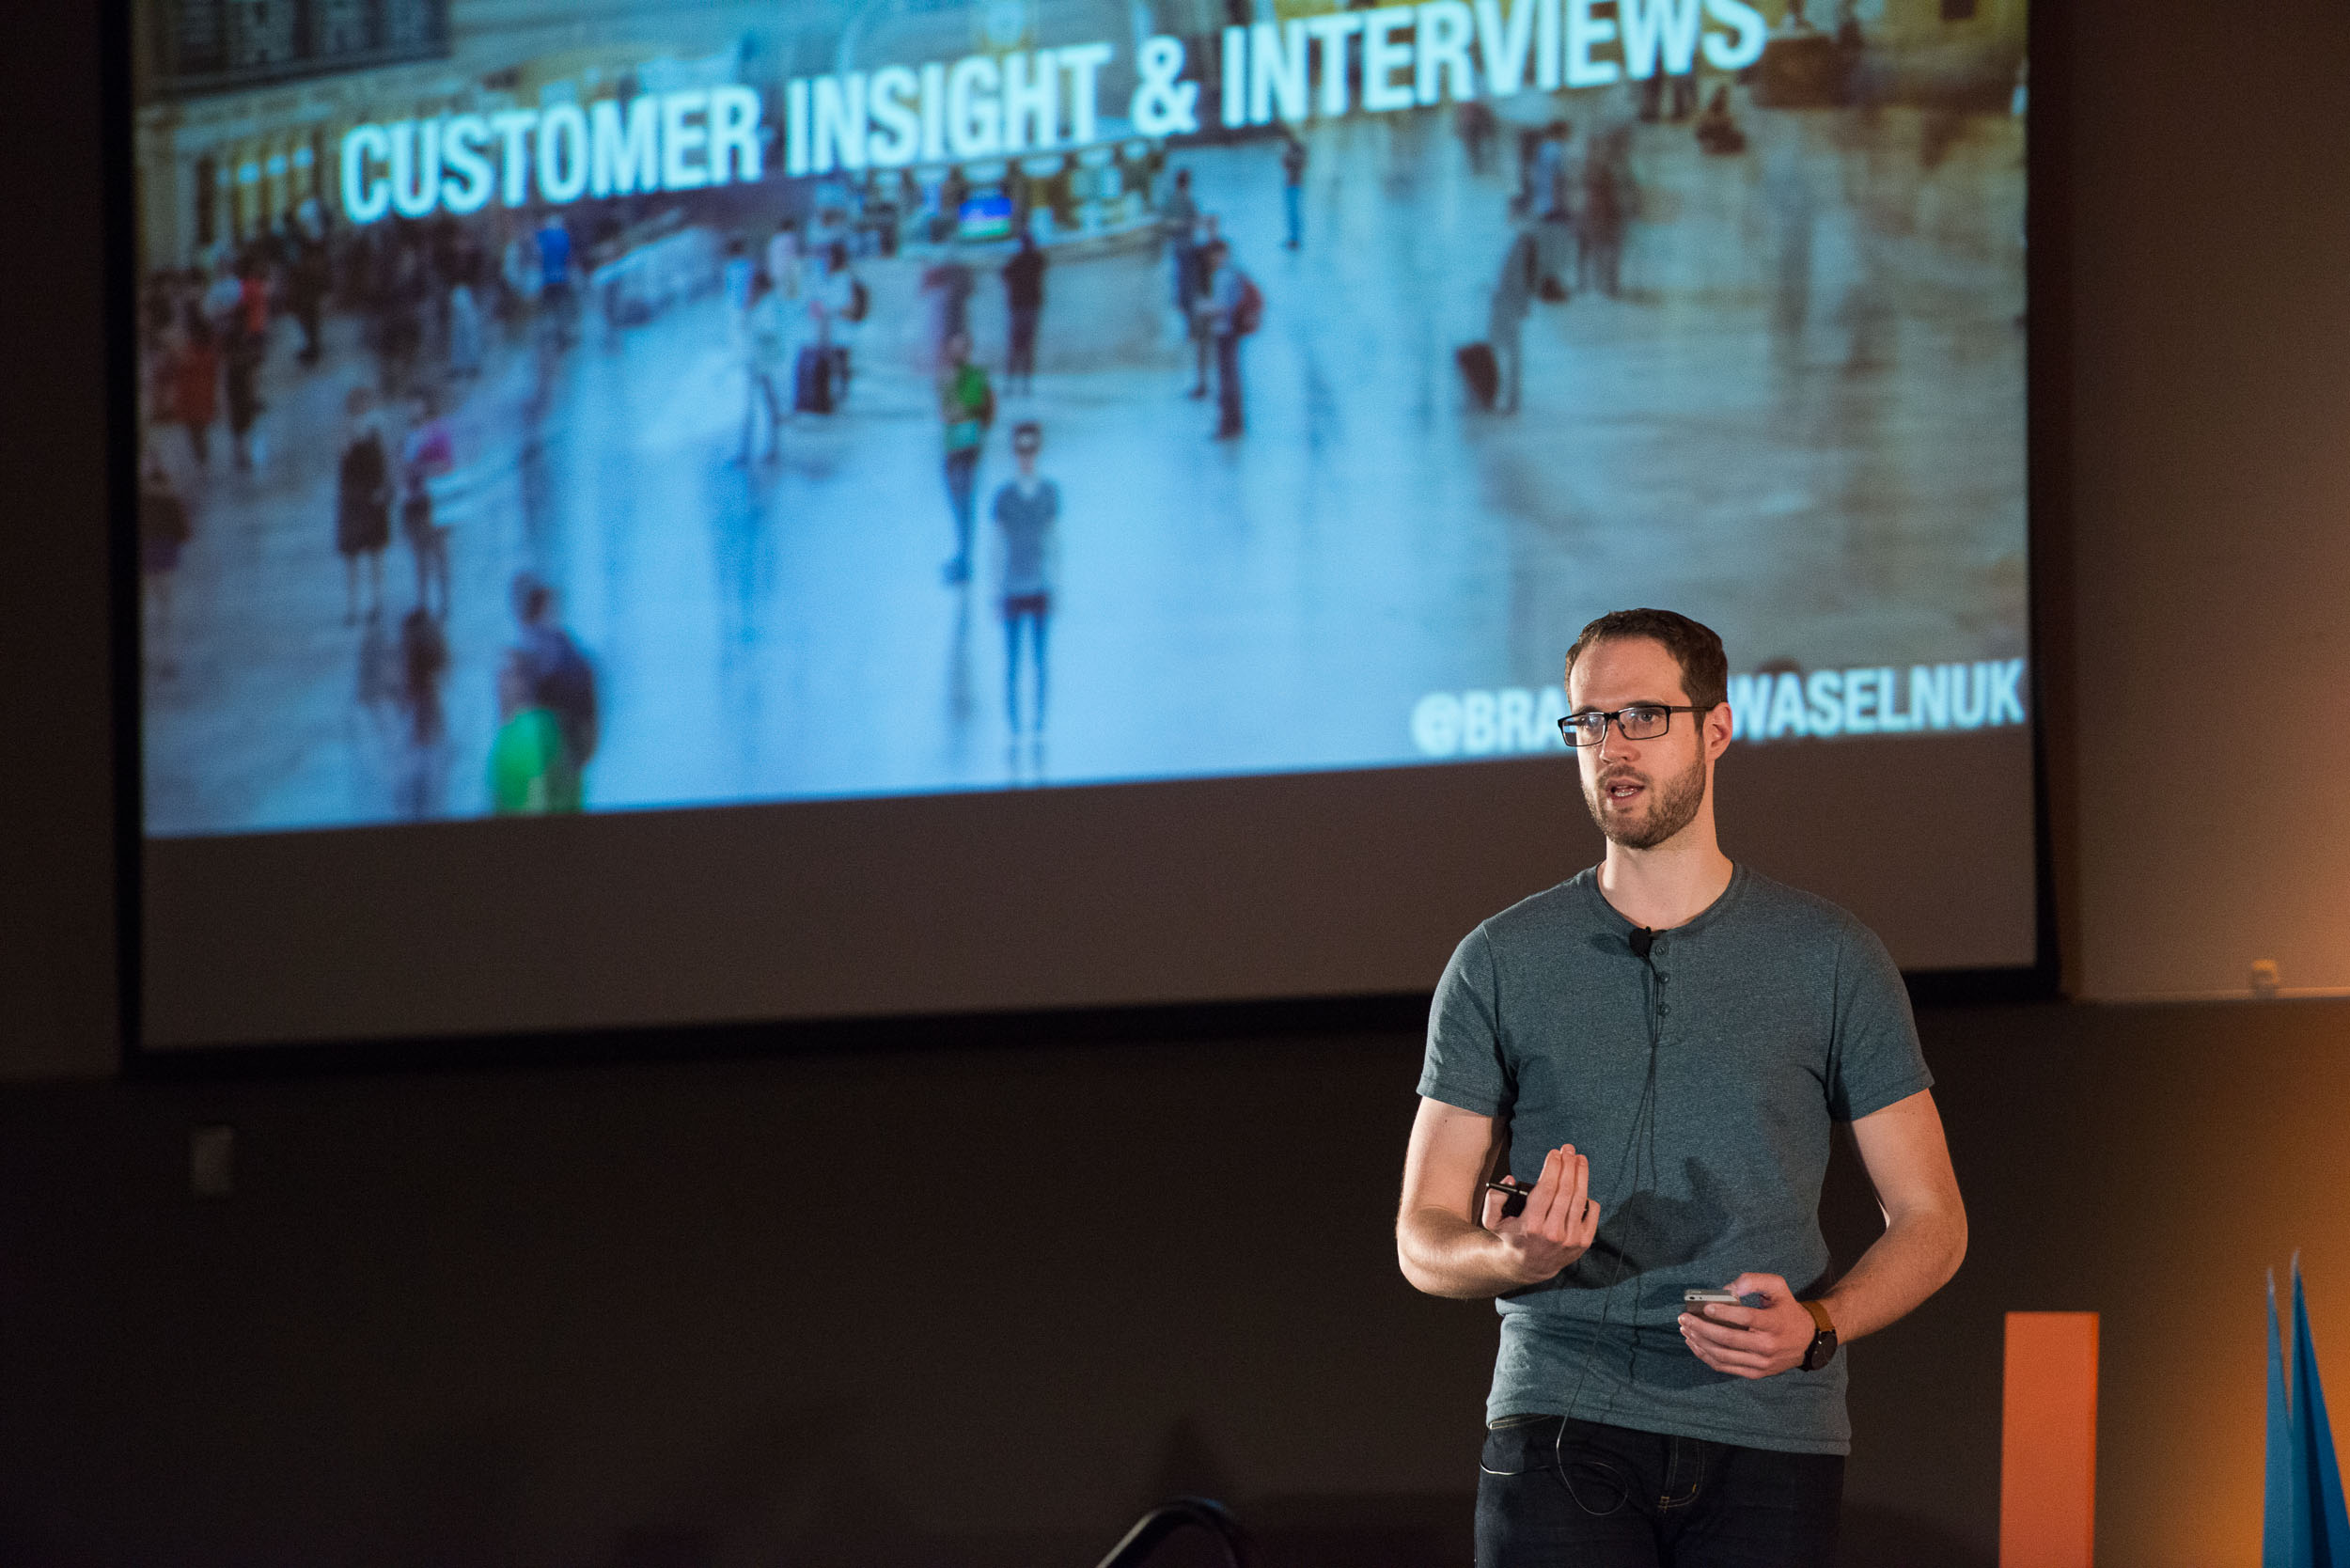 Brandon Waselnuk | CEO, Co-Founder of Tattoo Hero